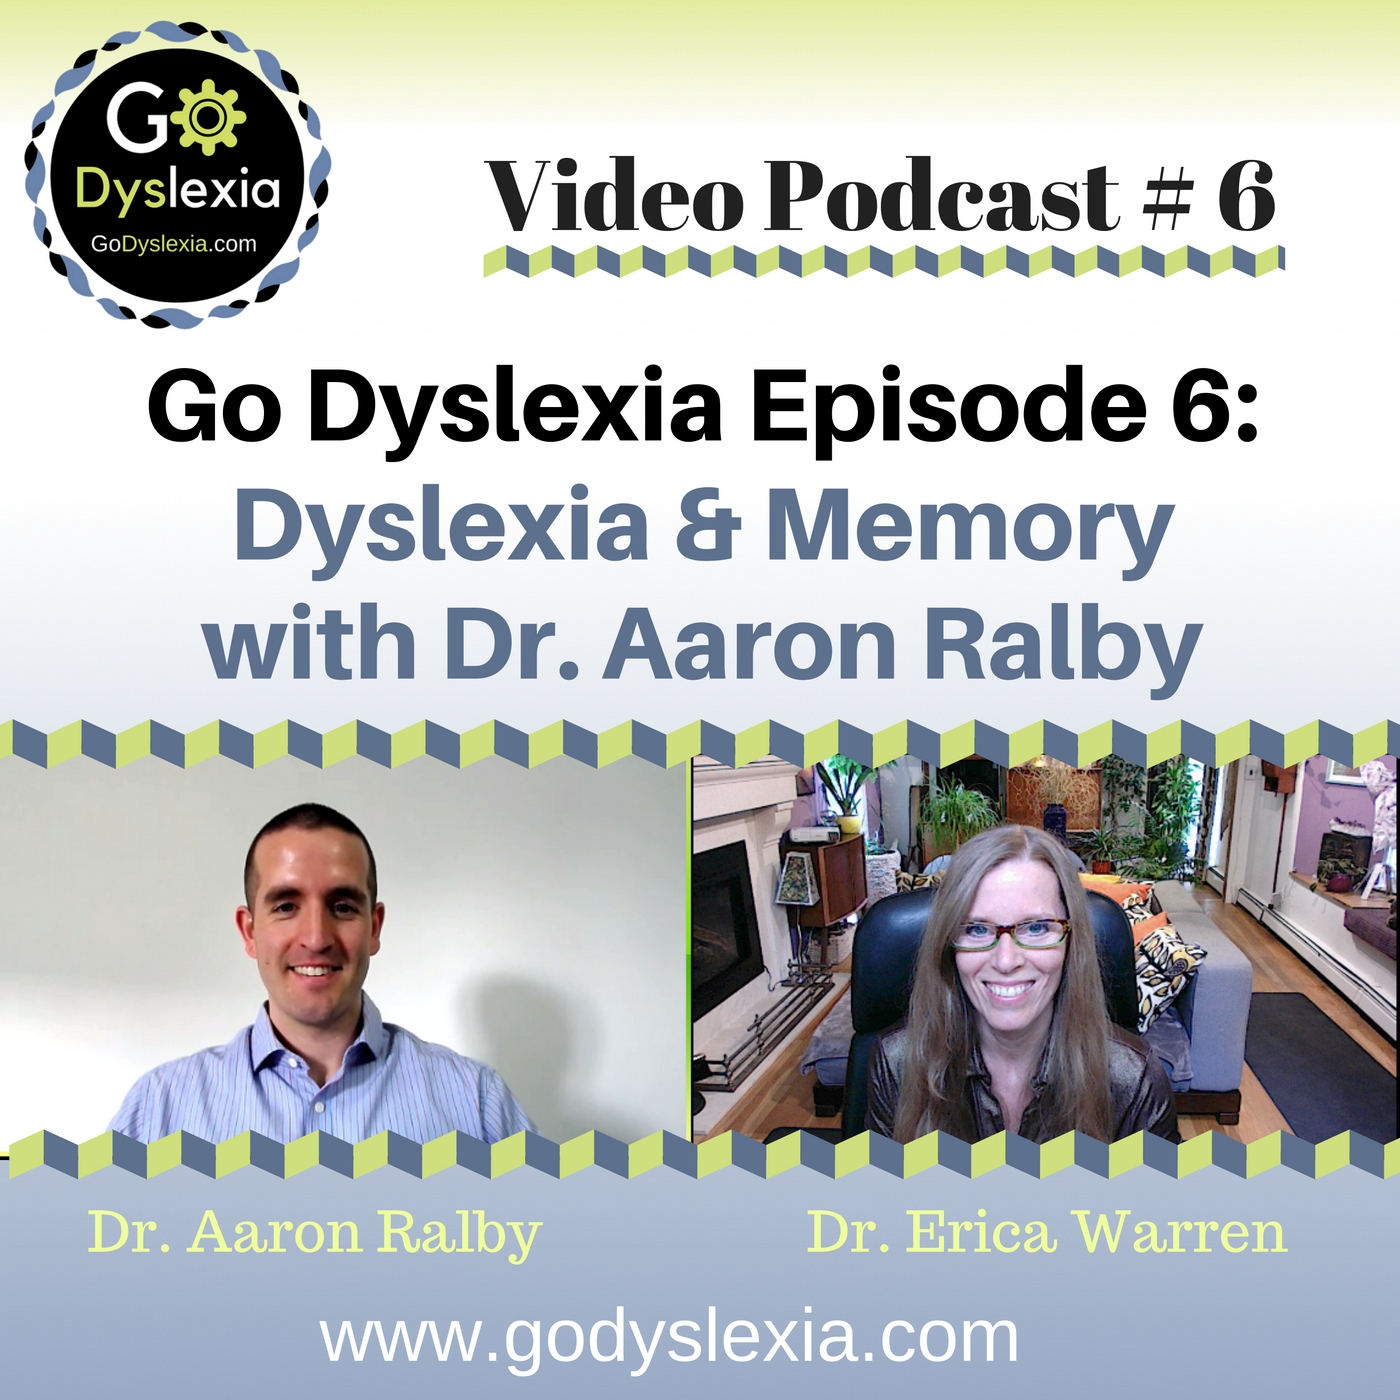 Go Dyslexia Episode 6: Dyslexia and Memory with Dr. Aaron Ralby